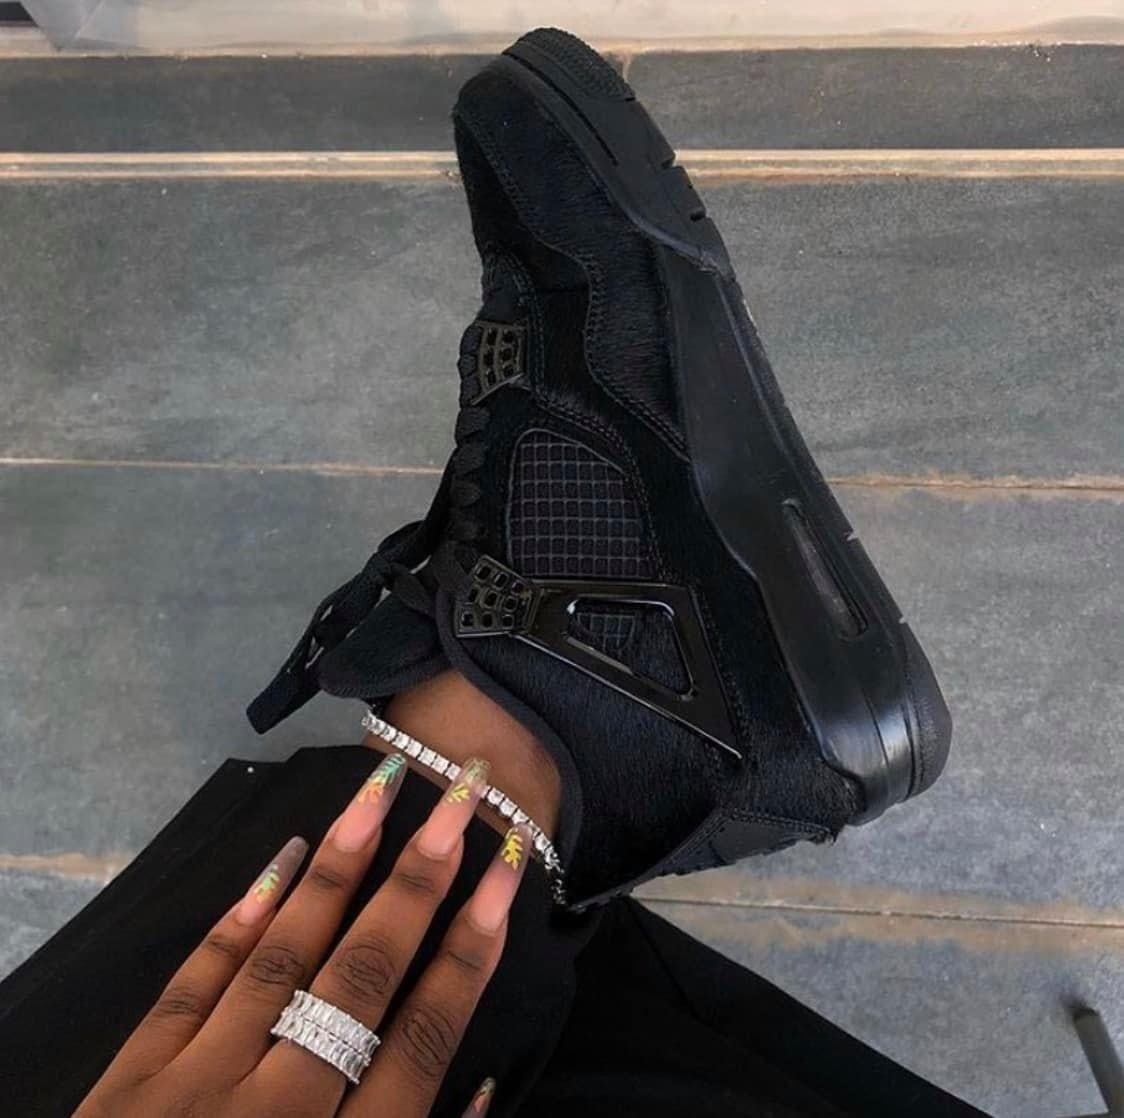 Jordan 4 Black Cats In 2020 Jordan 4 Black Jordan Shoes Girls Jordan Black Cat